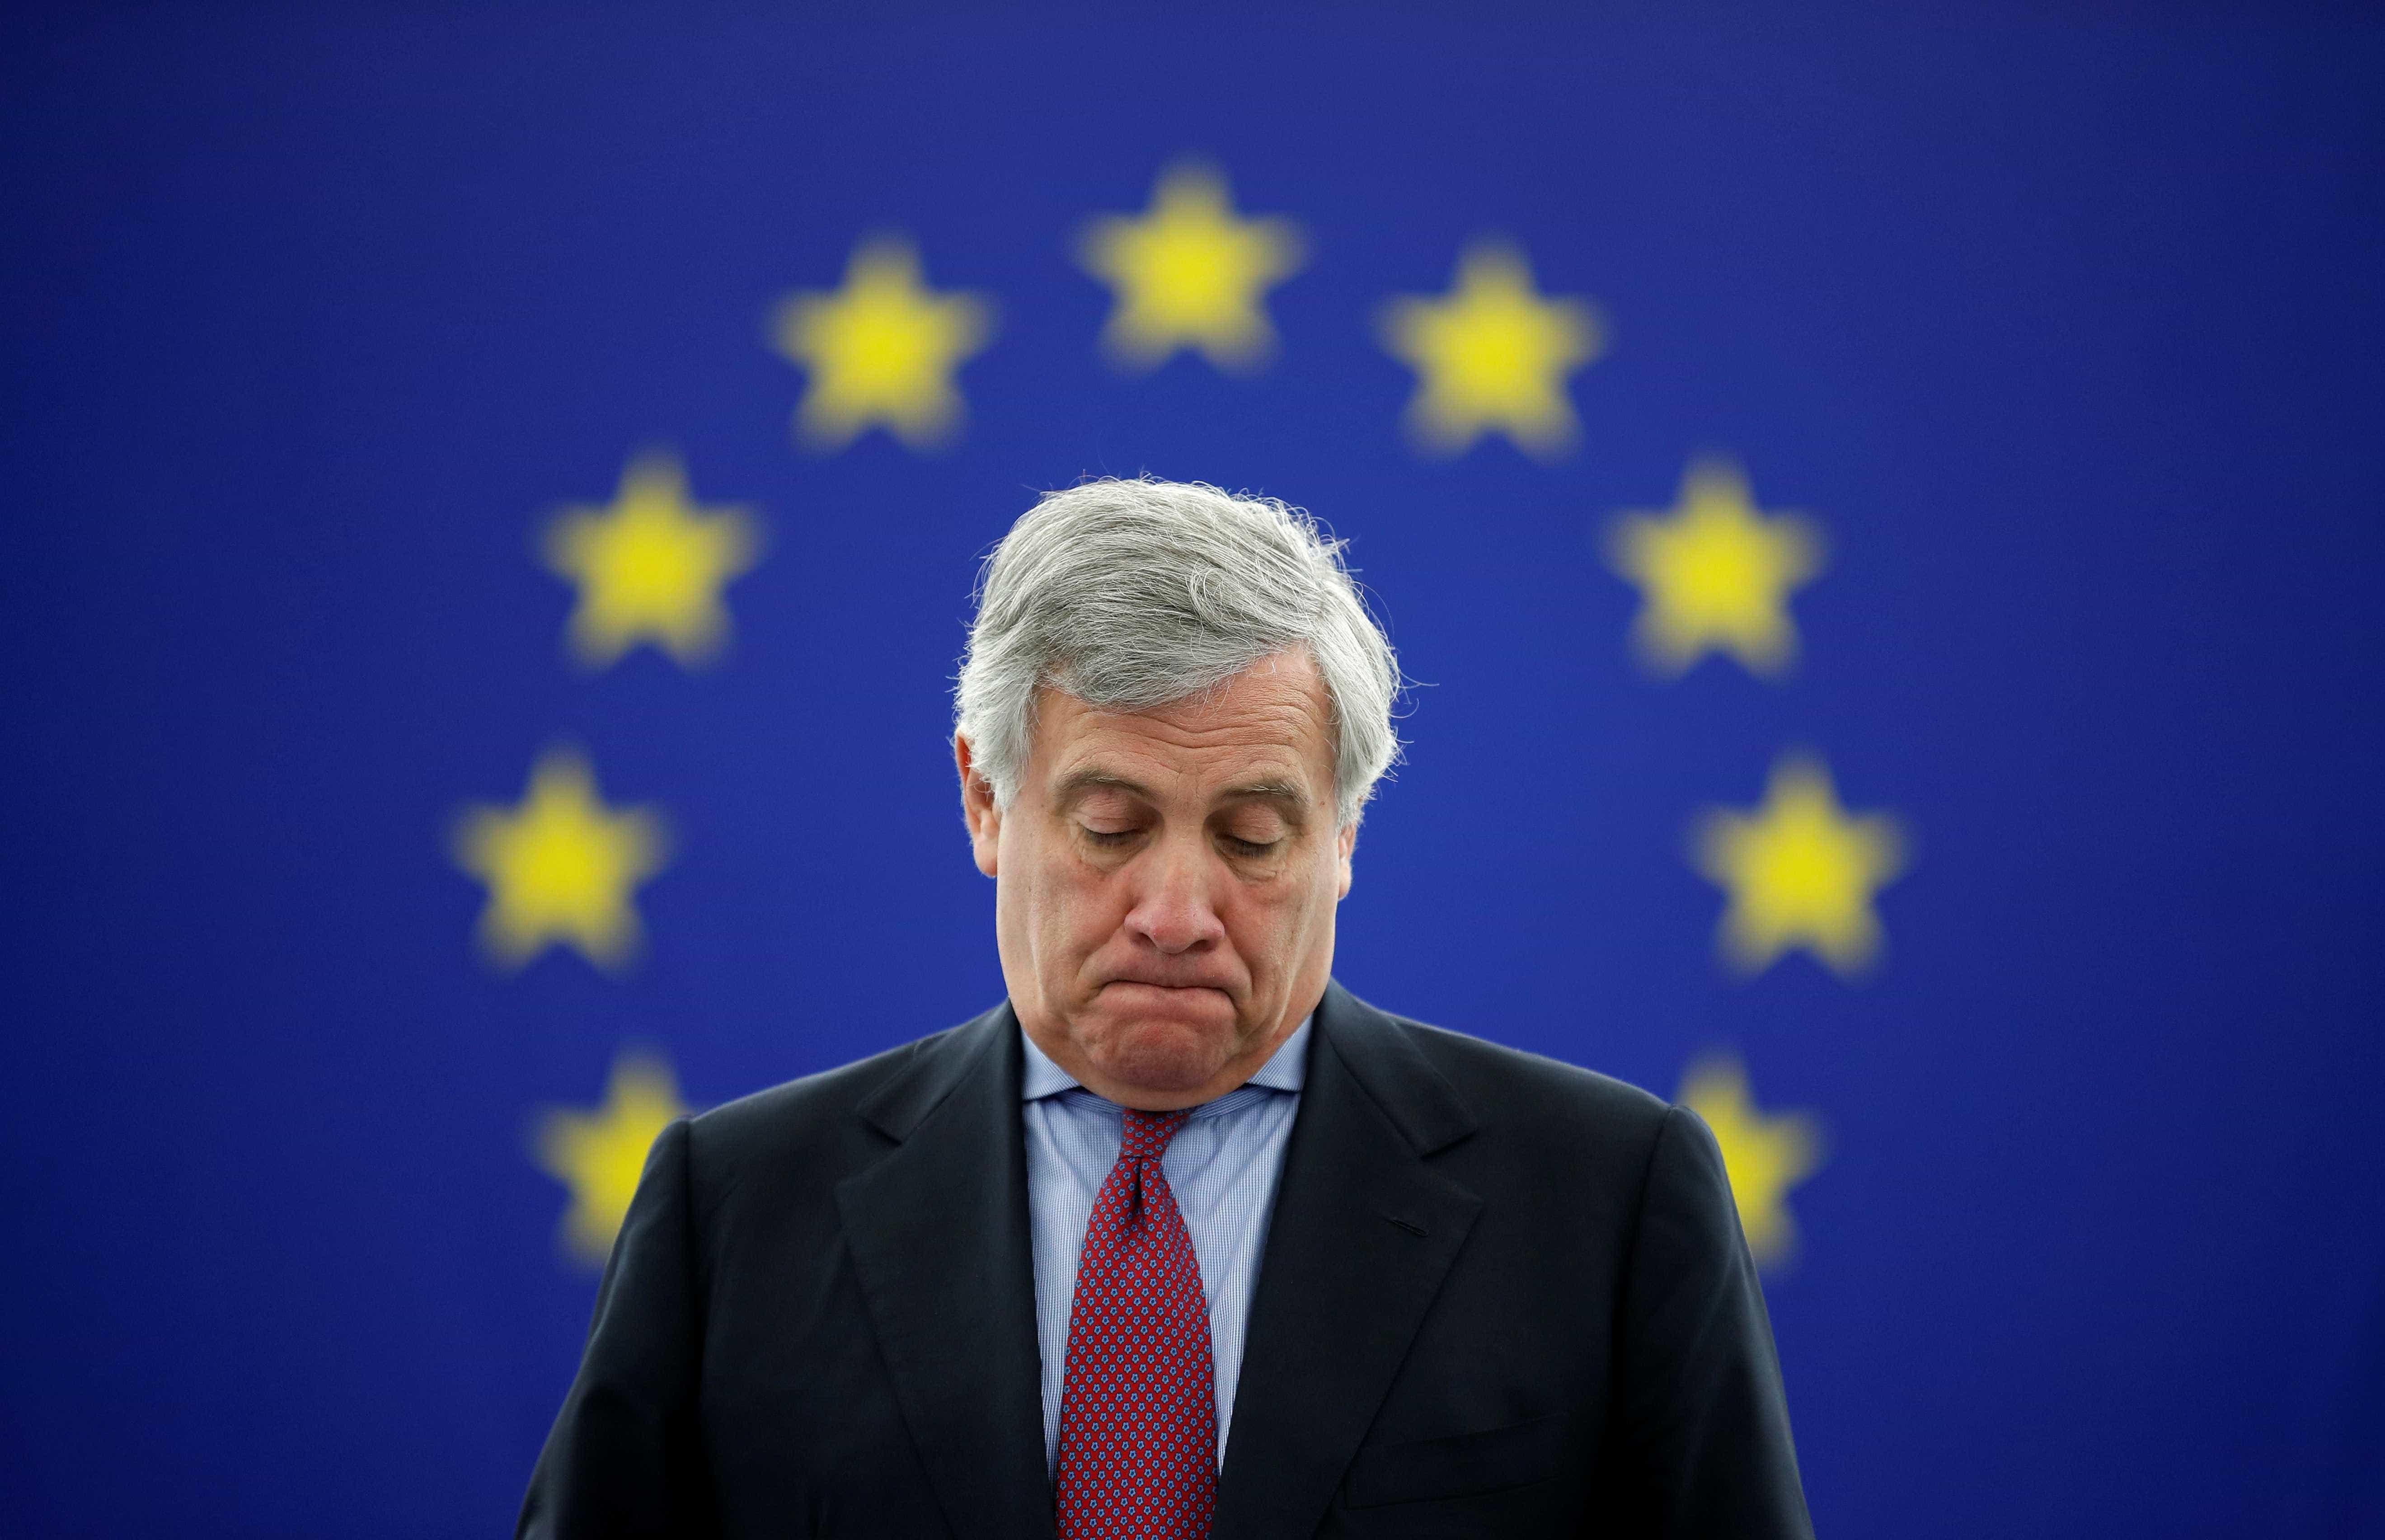 António Tajani pede desculpa por declarações sobre Mussolini